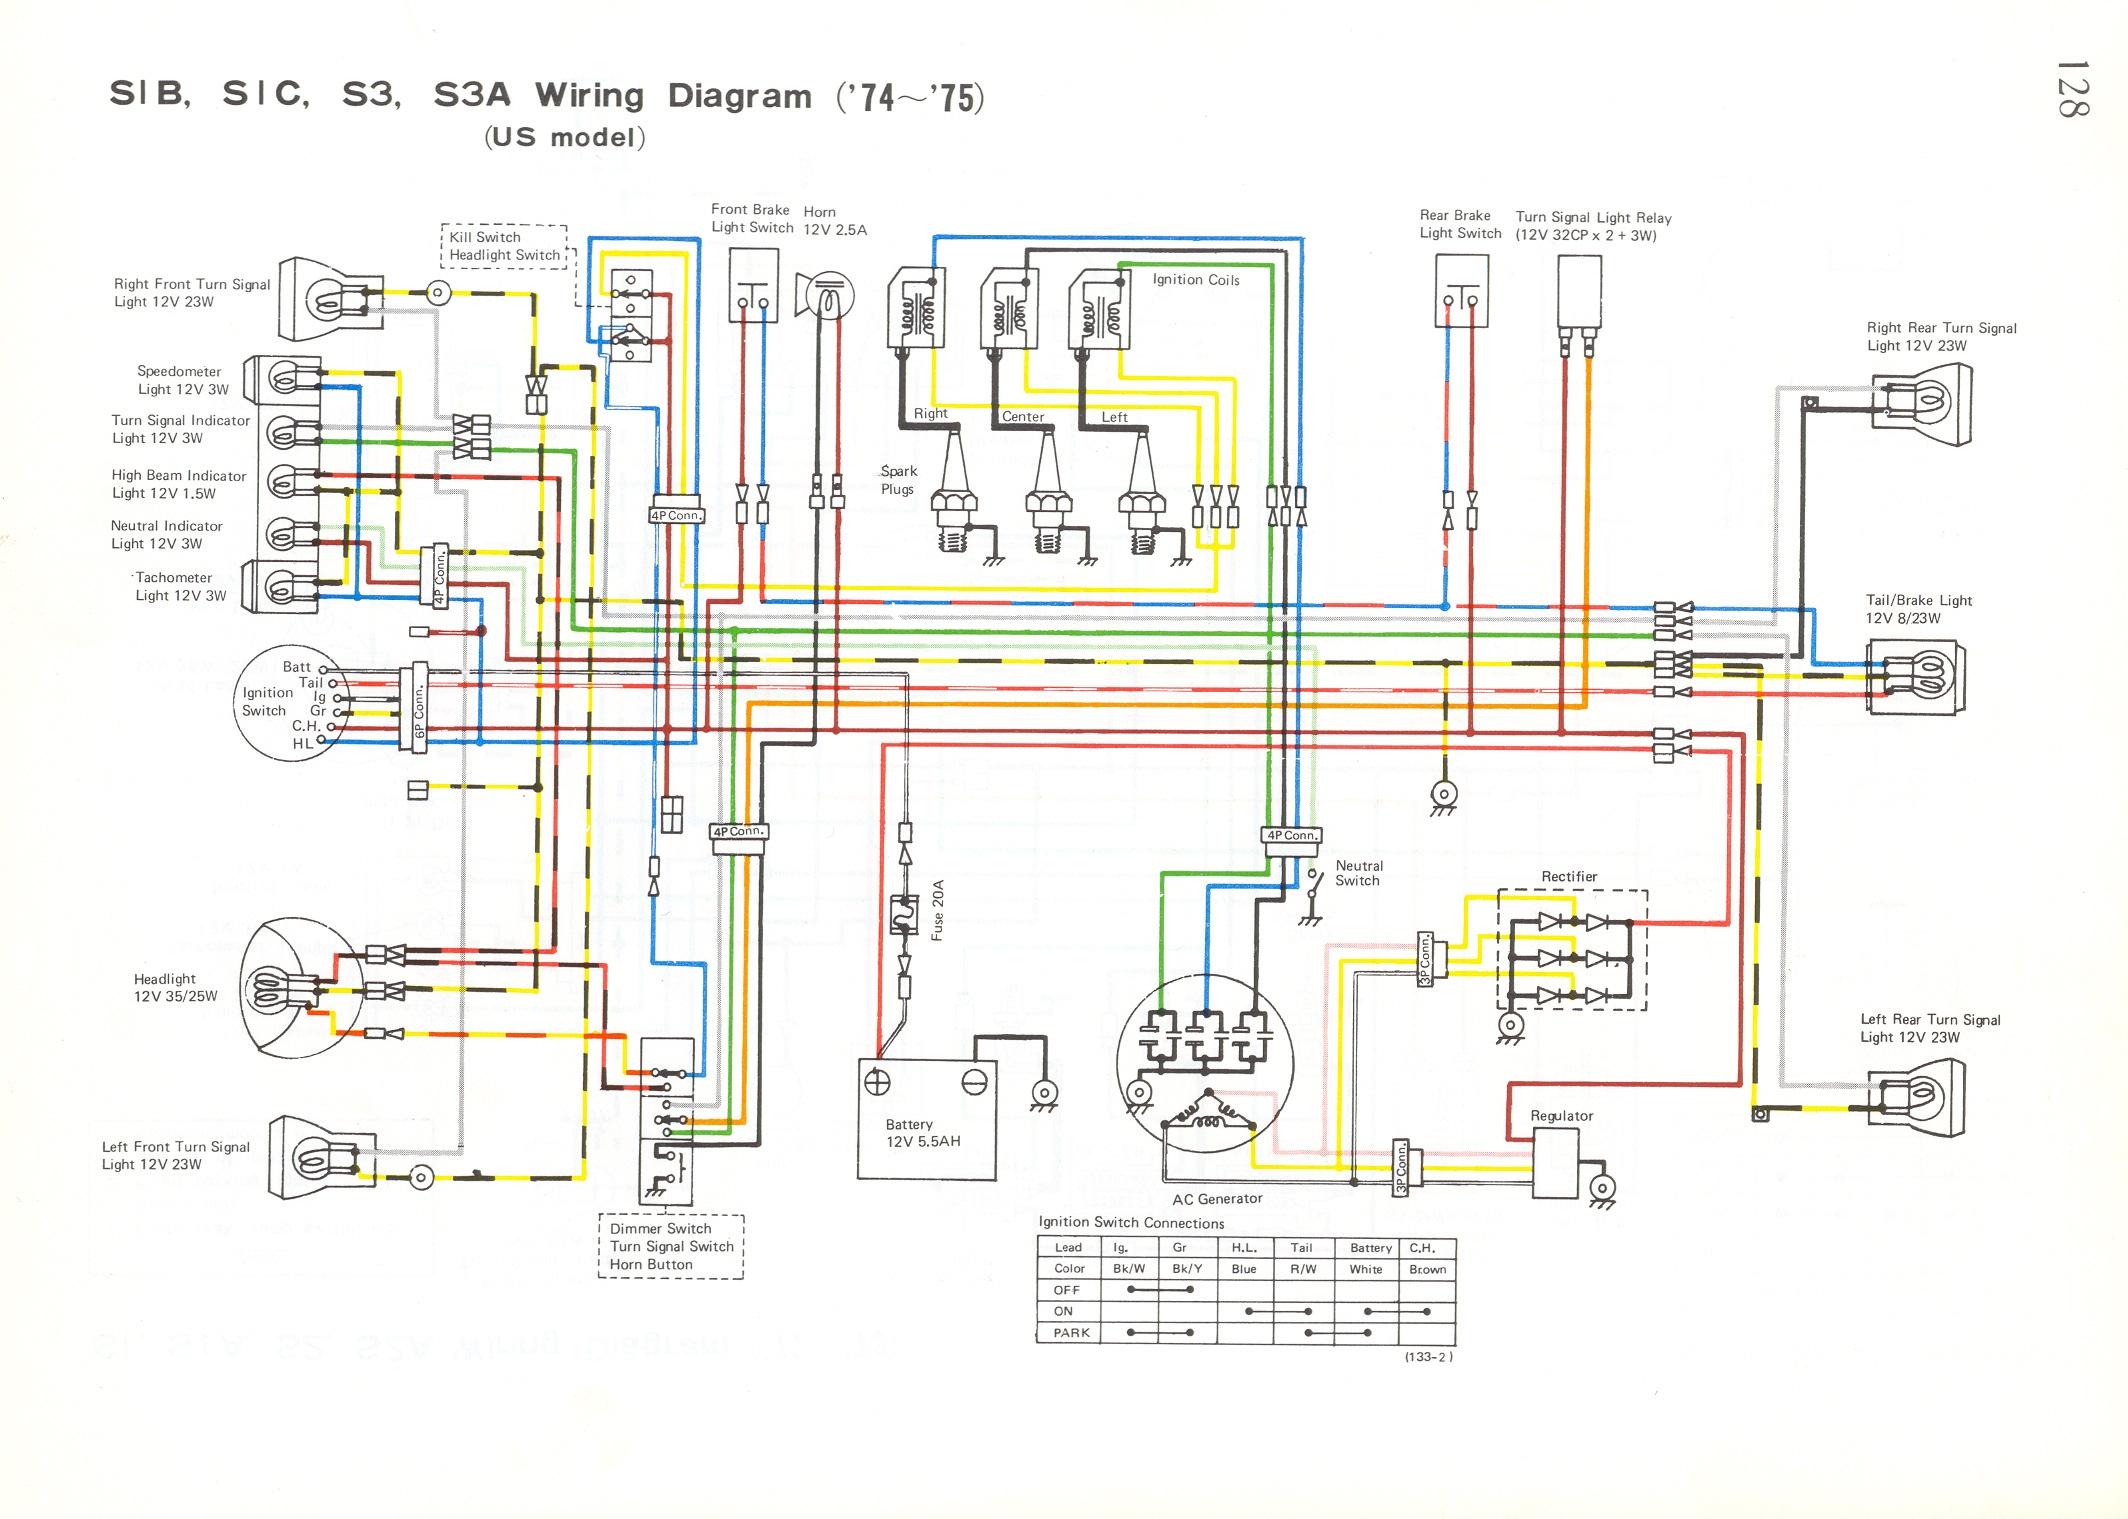 Ih 1486 Wiring Diagram Not Lossing 706 Lights For Cub Cadet 2140 Parts Farmall 12 Volt